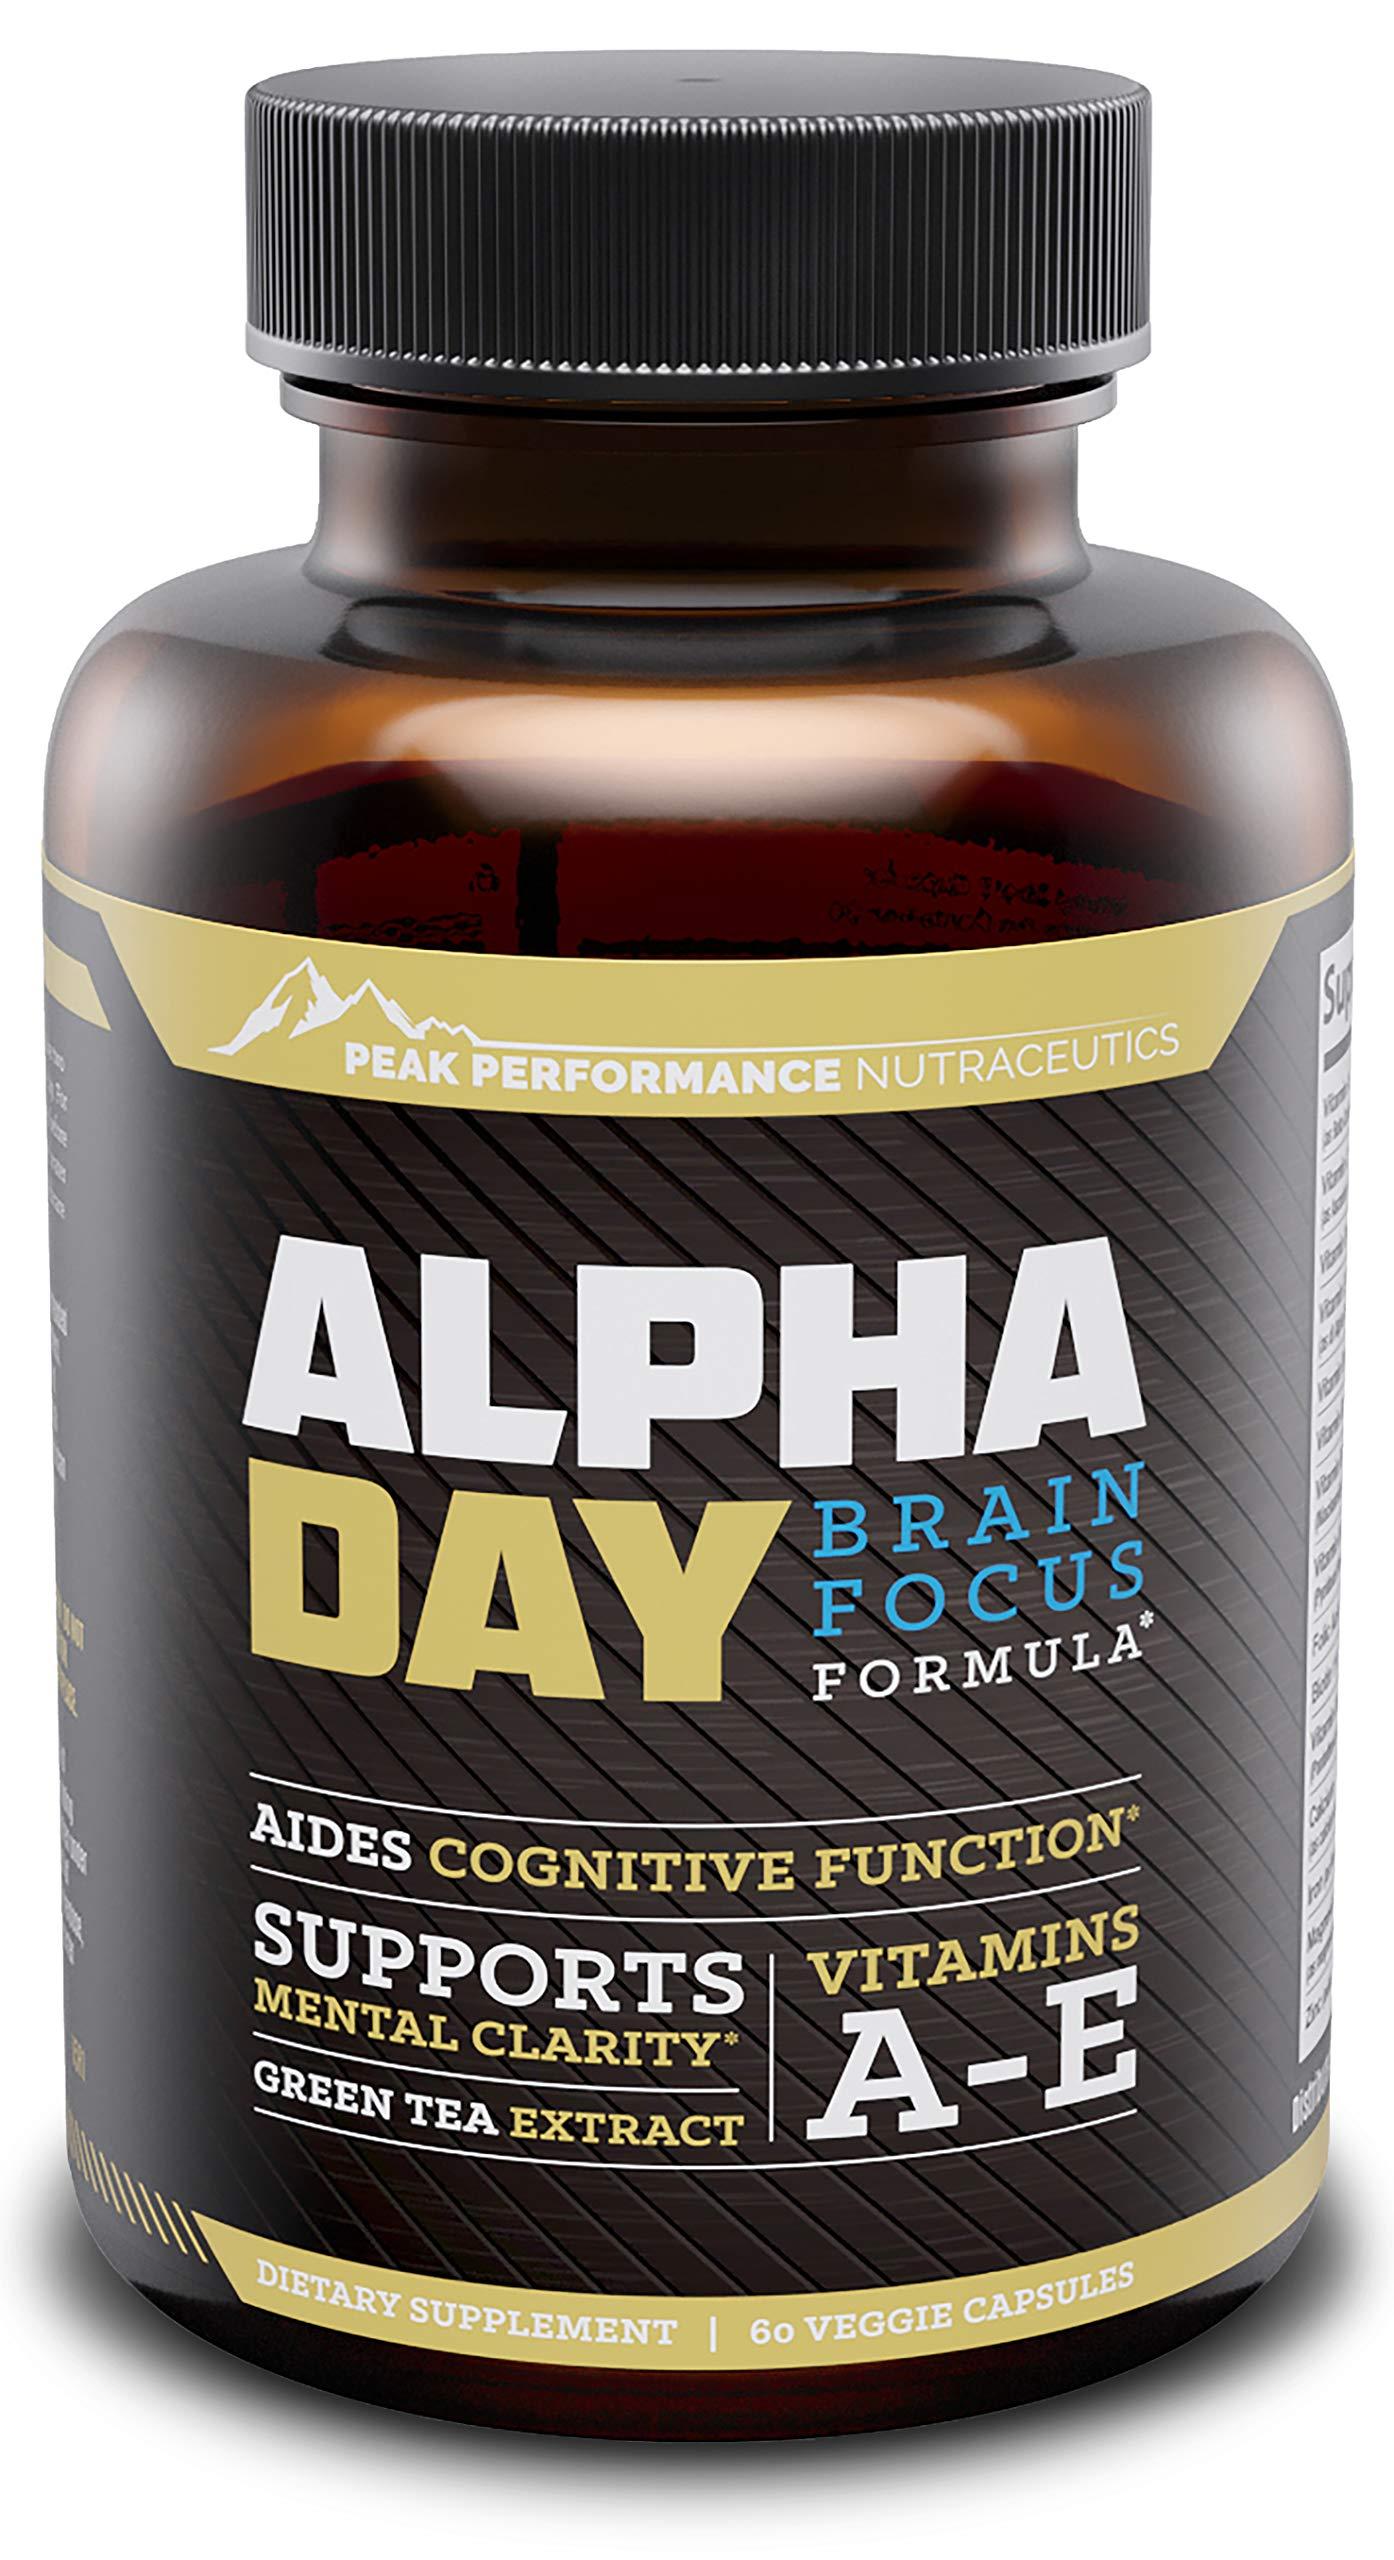 Alpha Day Nootropics & Brain Supplement Vitamin   Nootropic Energy Pills   Focus & Memory Booster   Mental Clarity, Concentration Support & Cognitive Enhancement   Bacopa Monnieri & DMAE   60 Pills